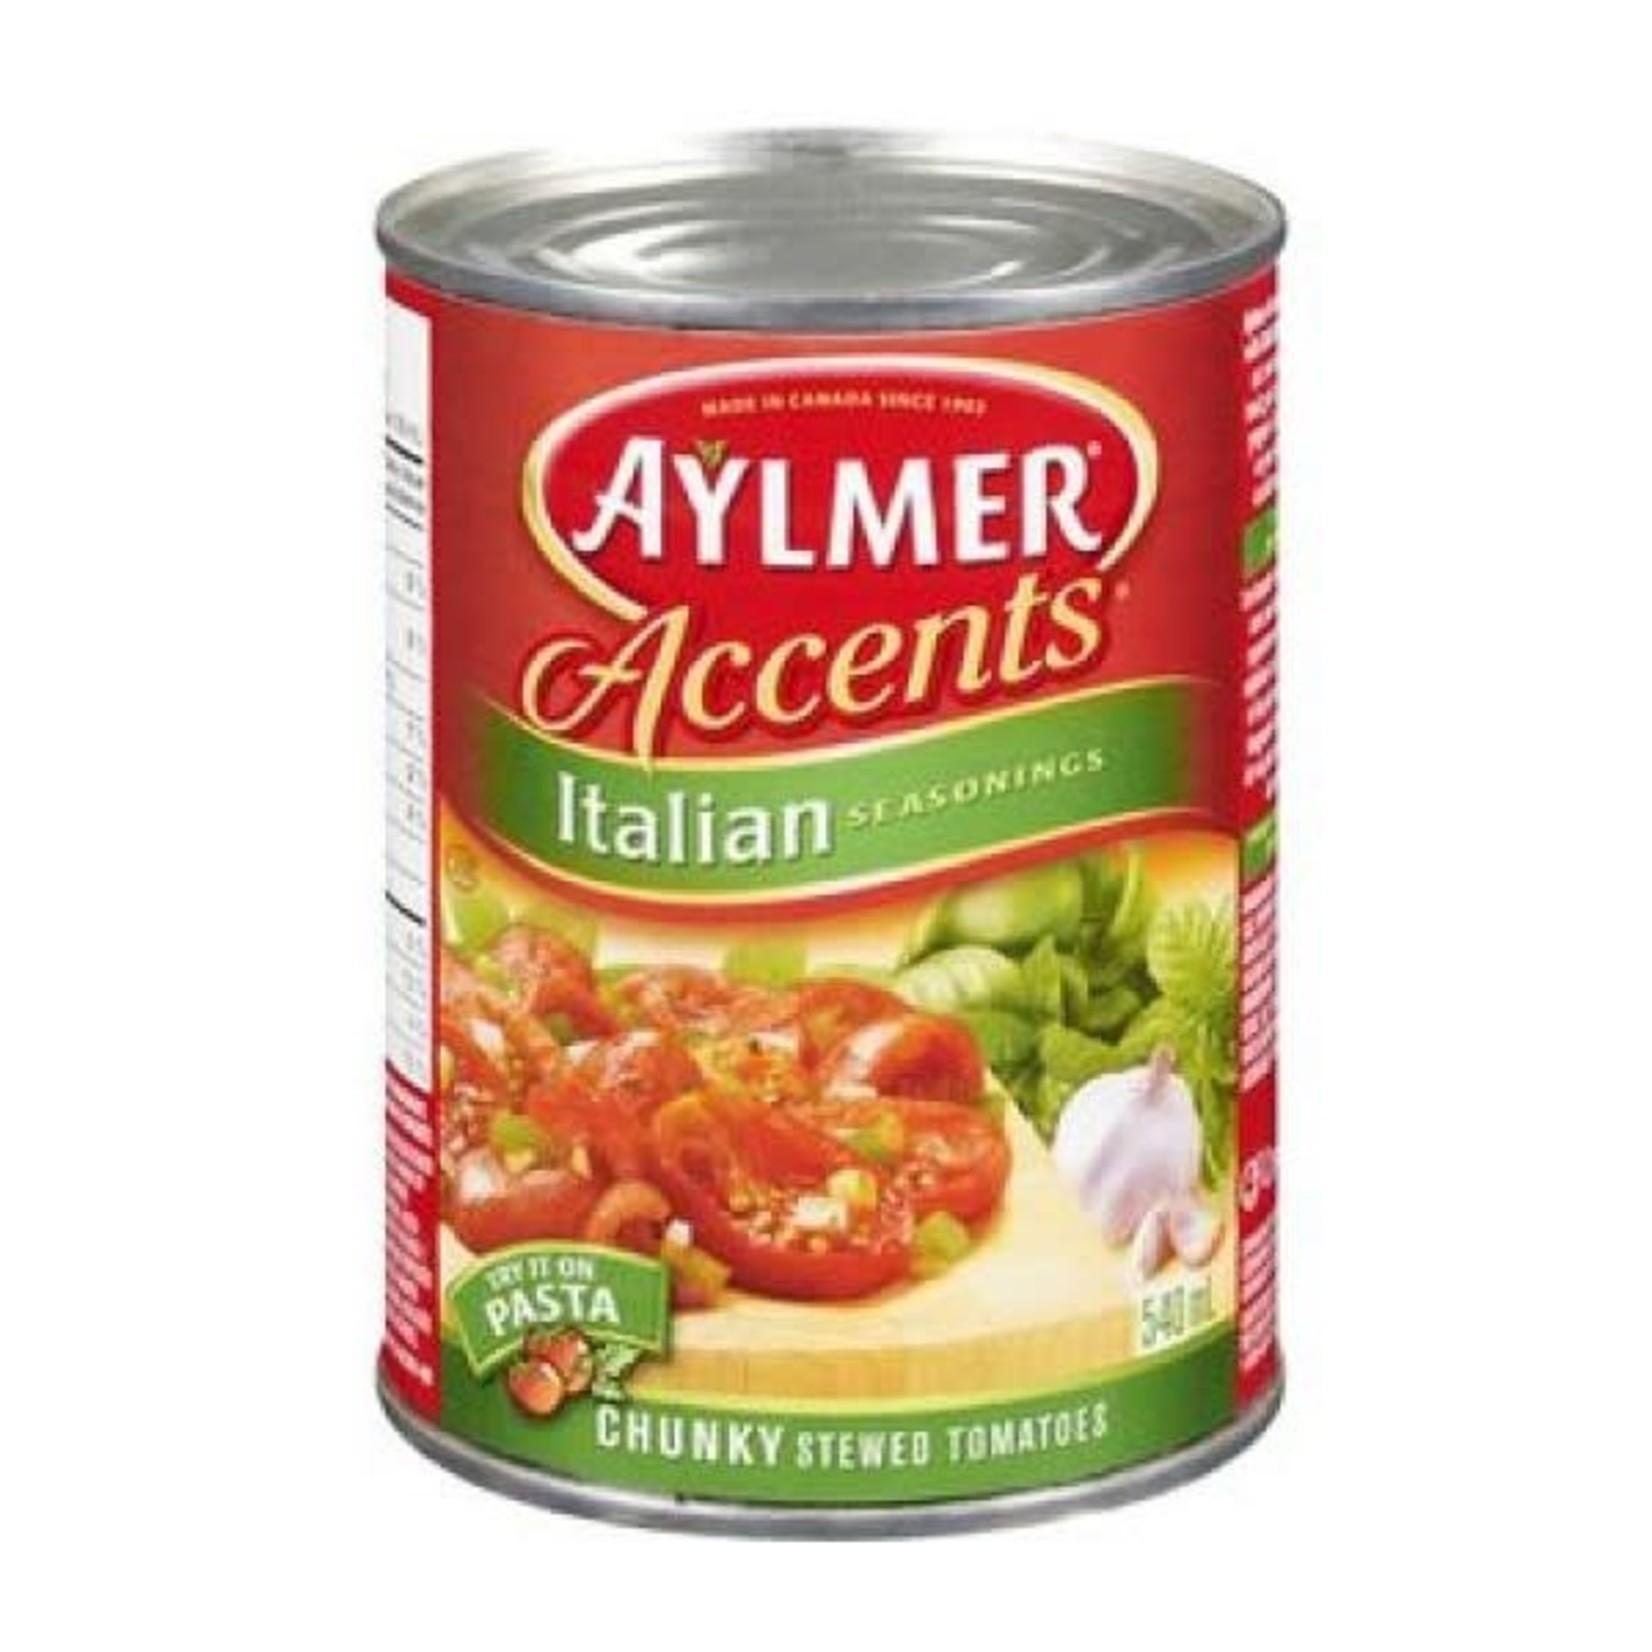 Aylmer Accents Tomatoes - Italian Seasonings  540ml